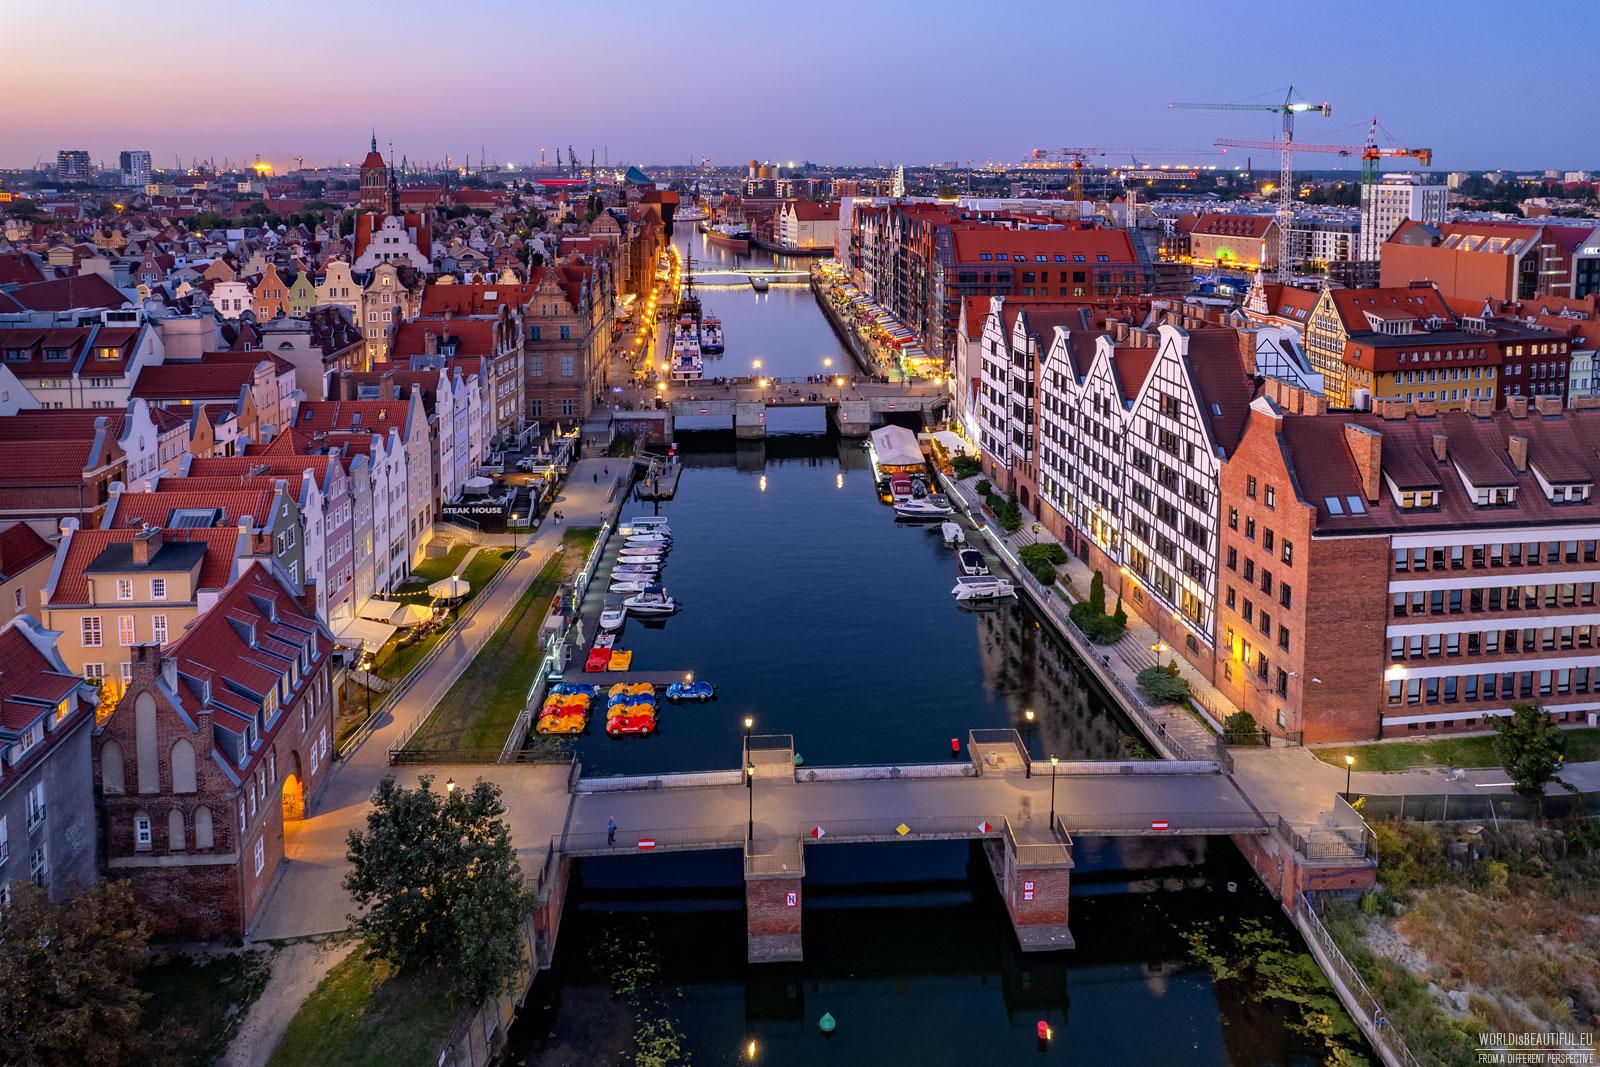 Motlawa river in the center of Gdańsk